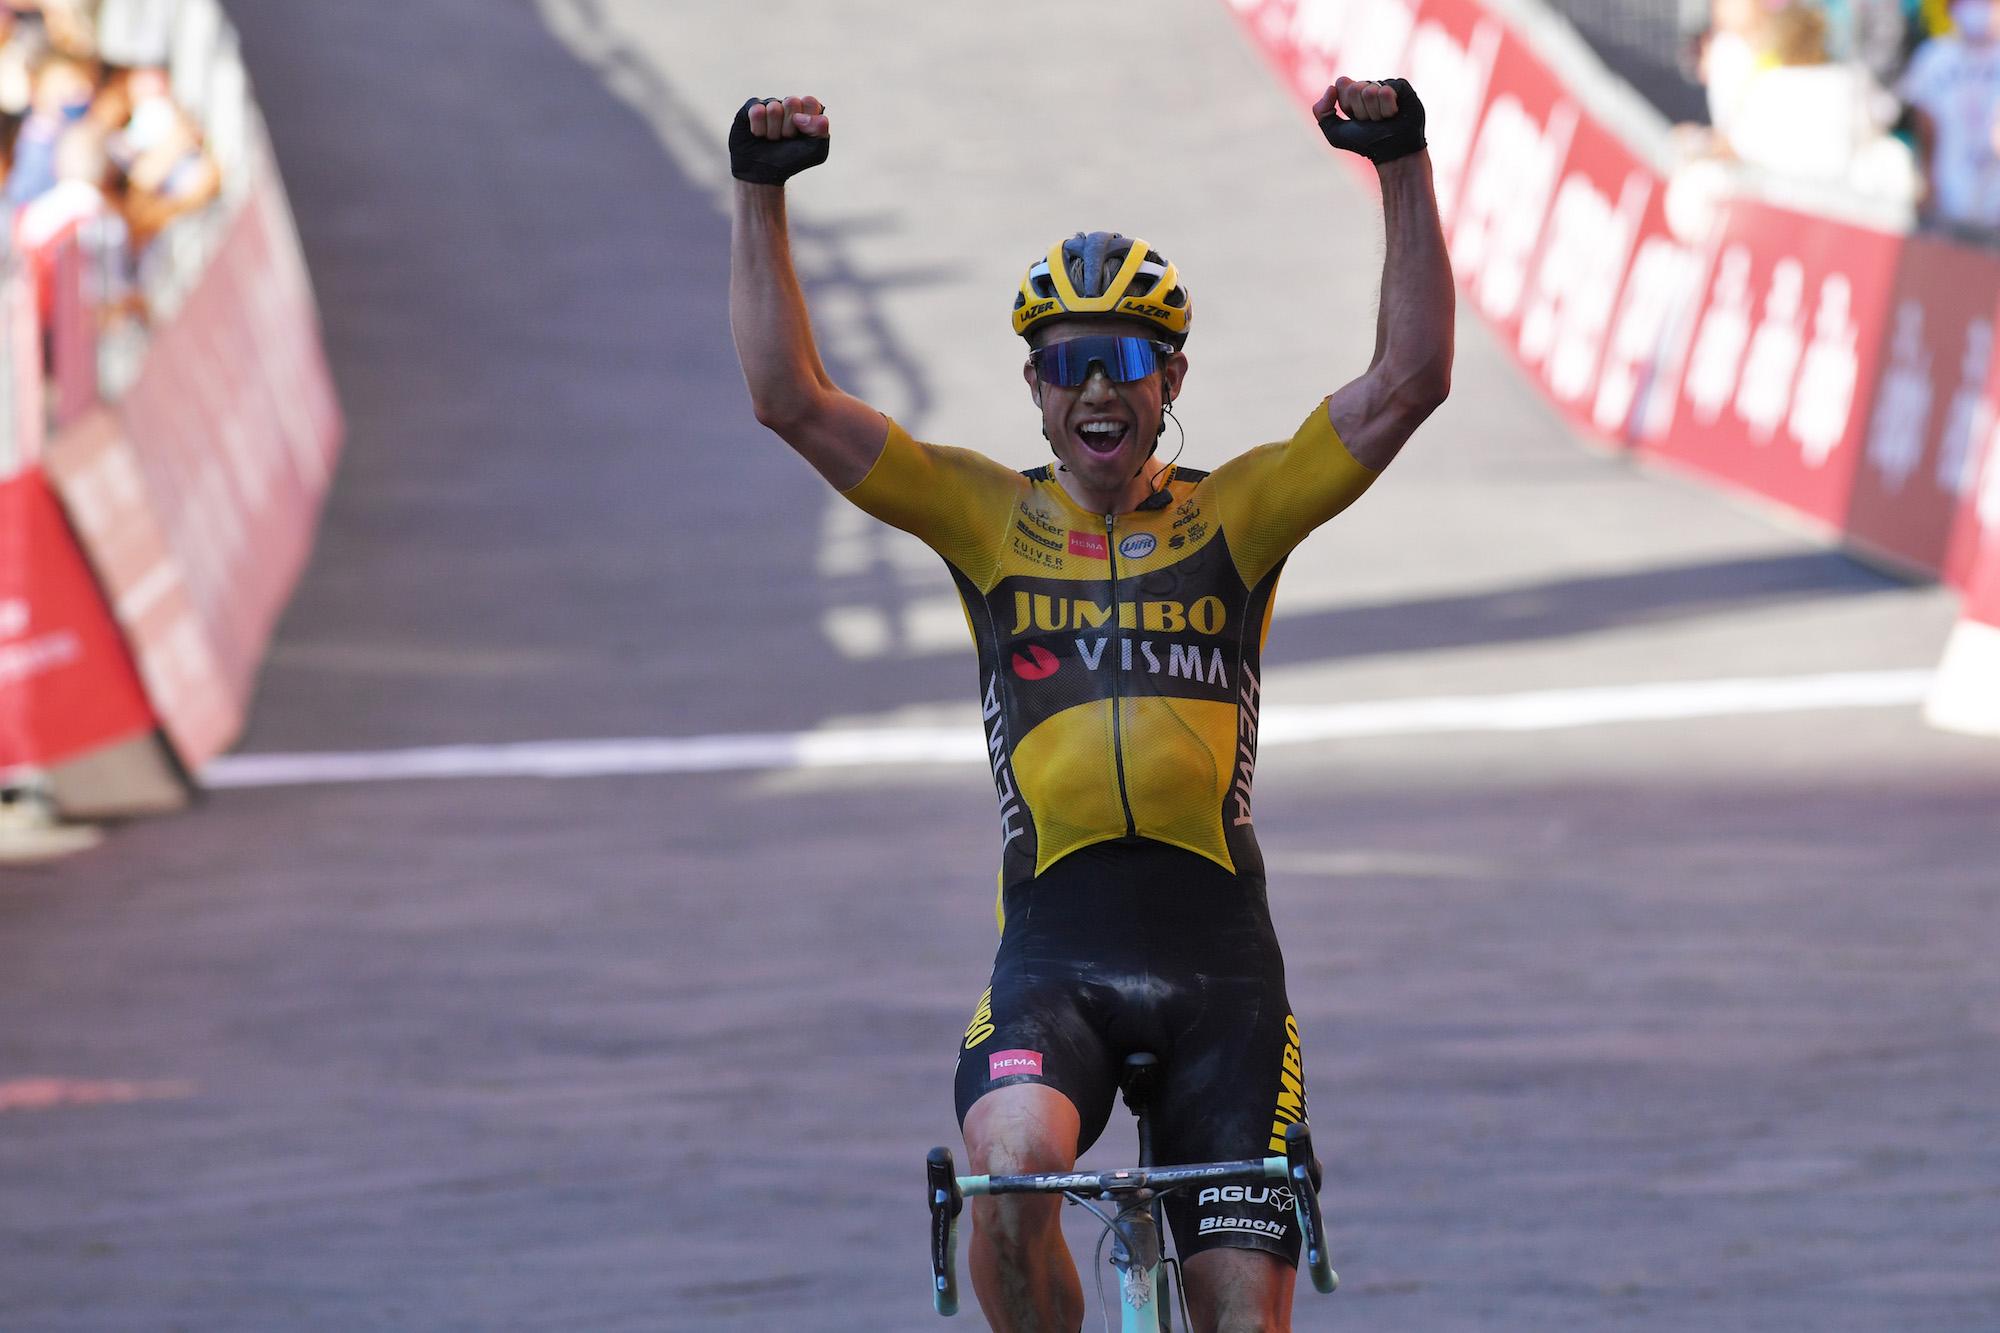 Wout van Aert beats Julian Alaphilippe to win Milan-San Remo 2020 - Cycling Weekly